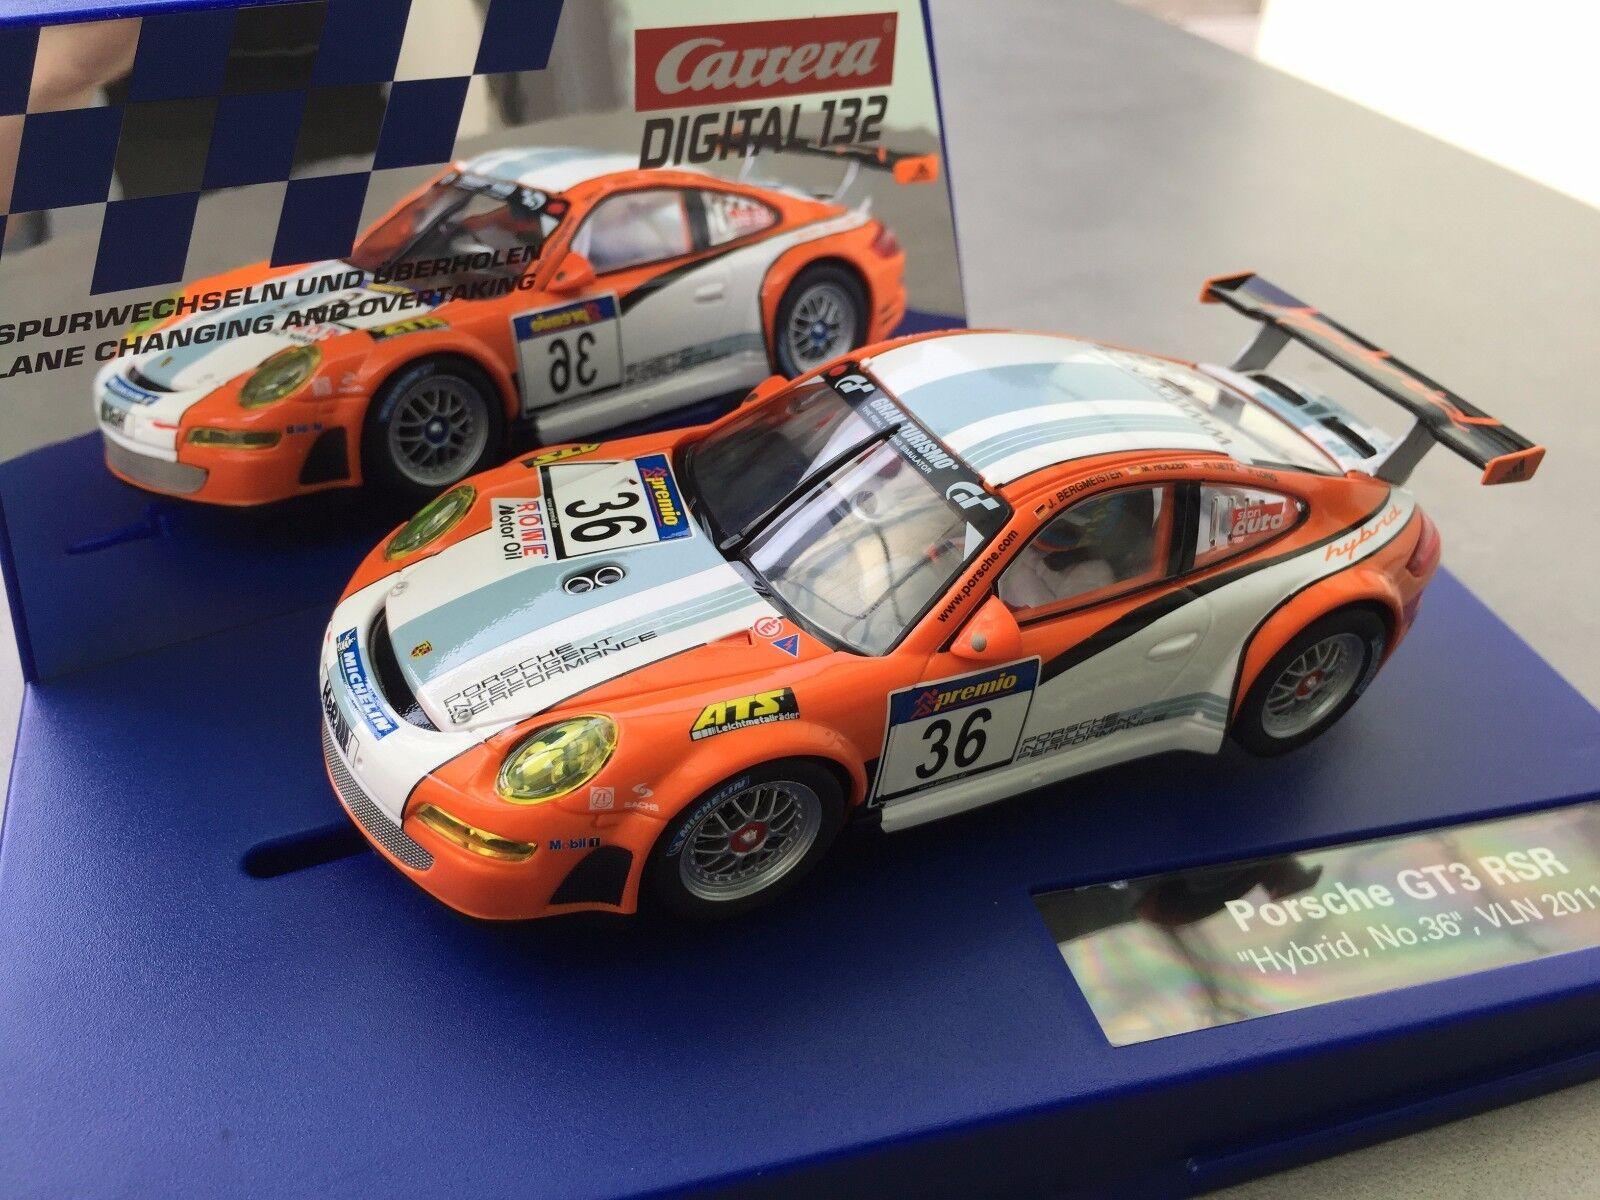 Carrera Digital 132 30714 Porsche GT3 RSR   Hybrid, no. 36   VLN 2011 NIP